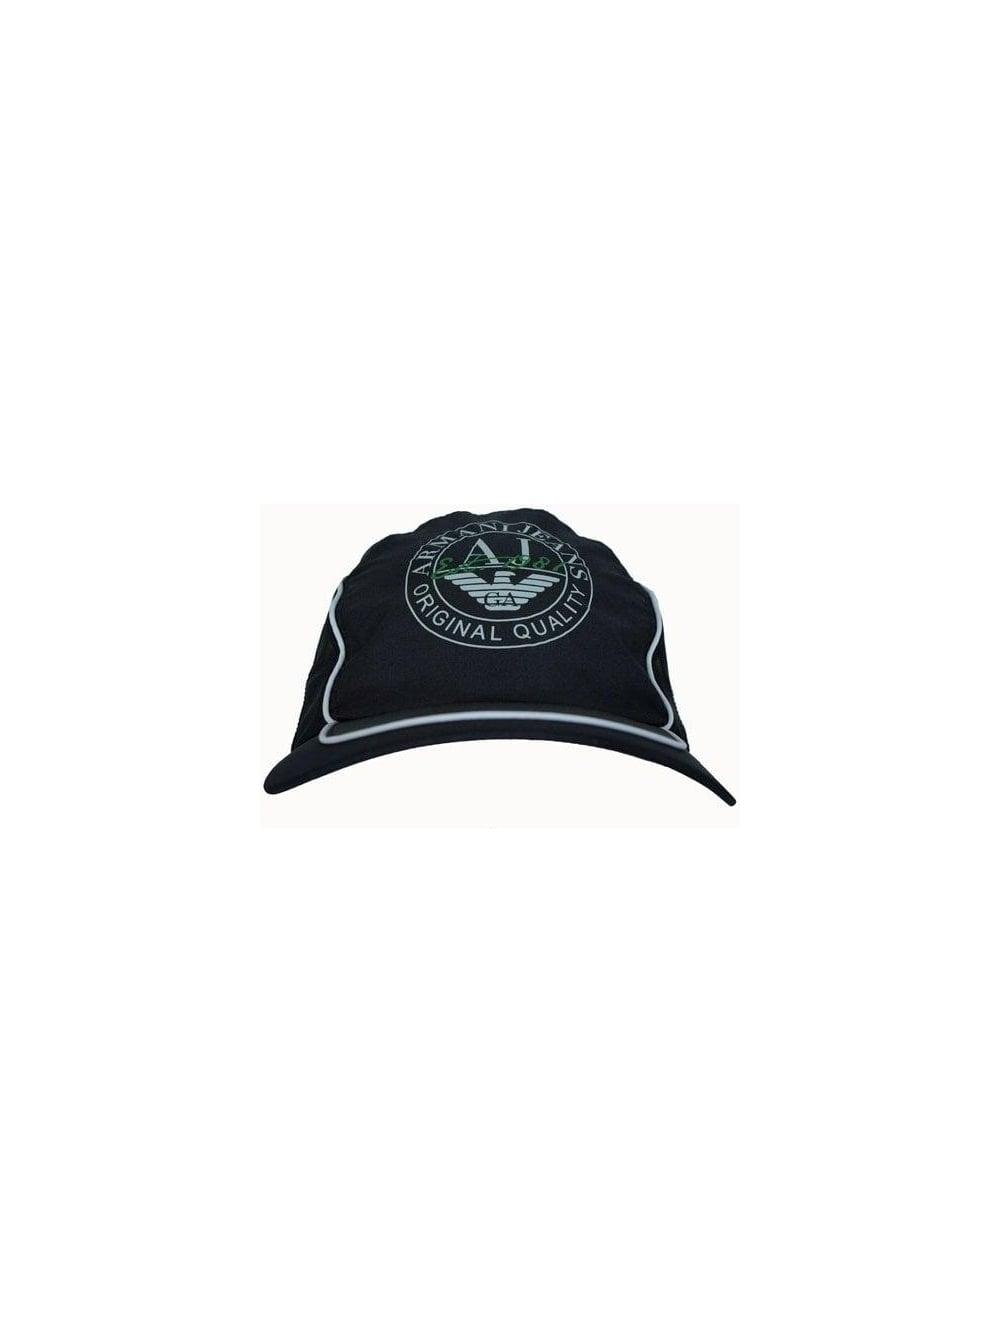 Armani Jeans Nylon Peak Cap - Black - Mens Designer Caps at Northern ... 431fe92e2bf